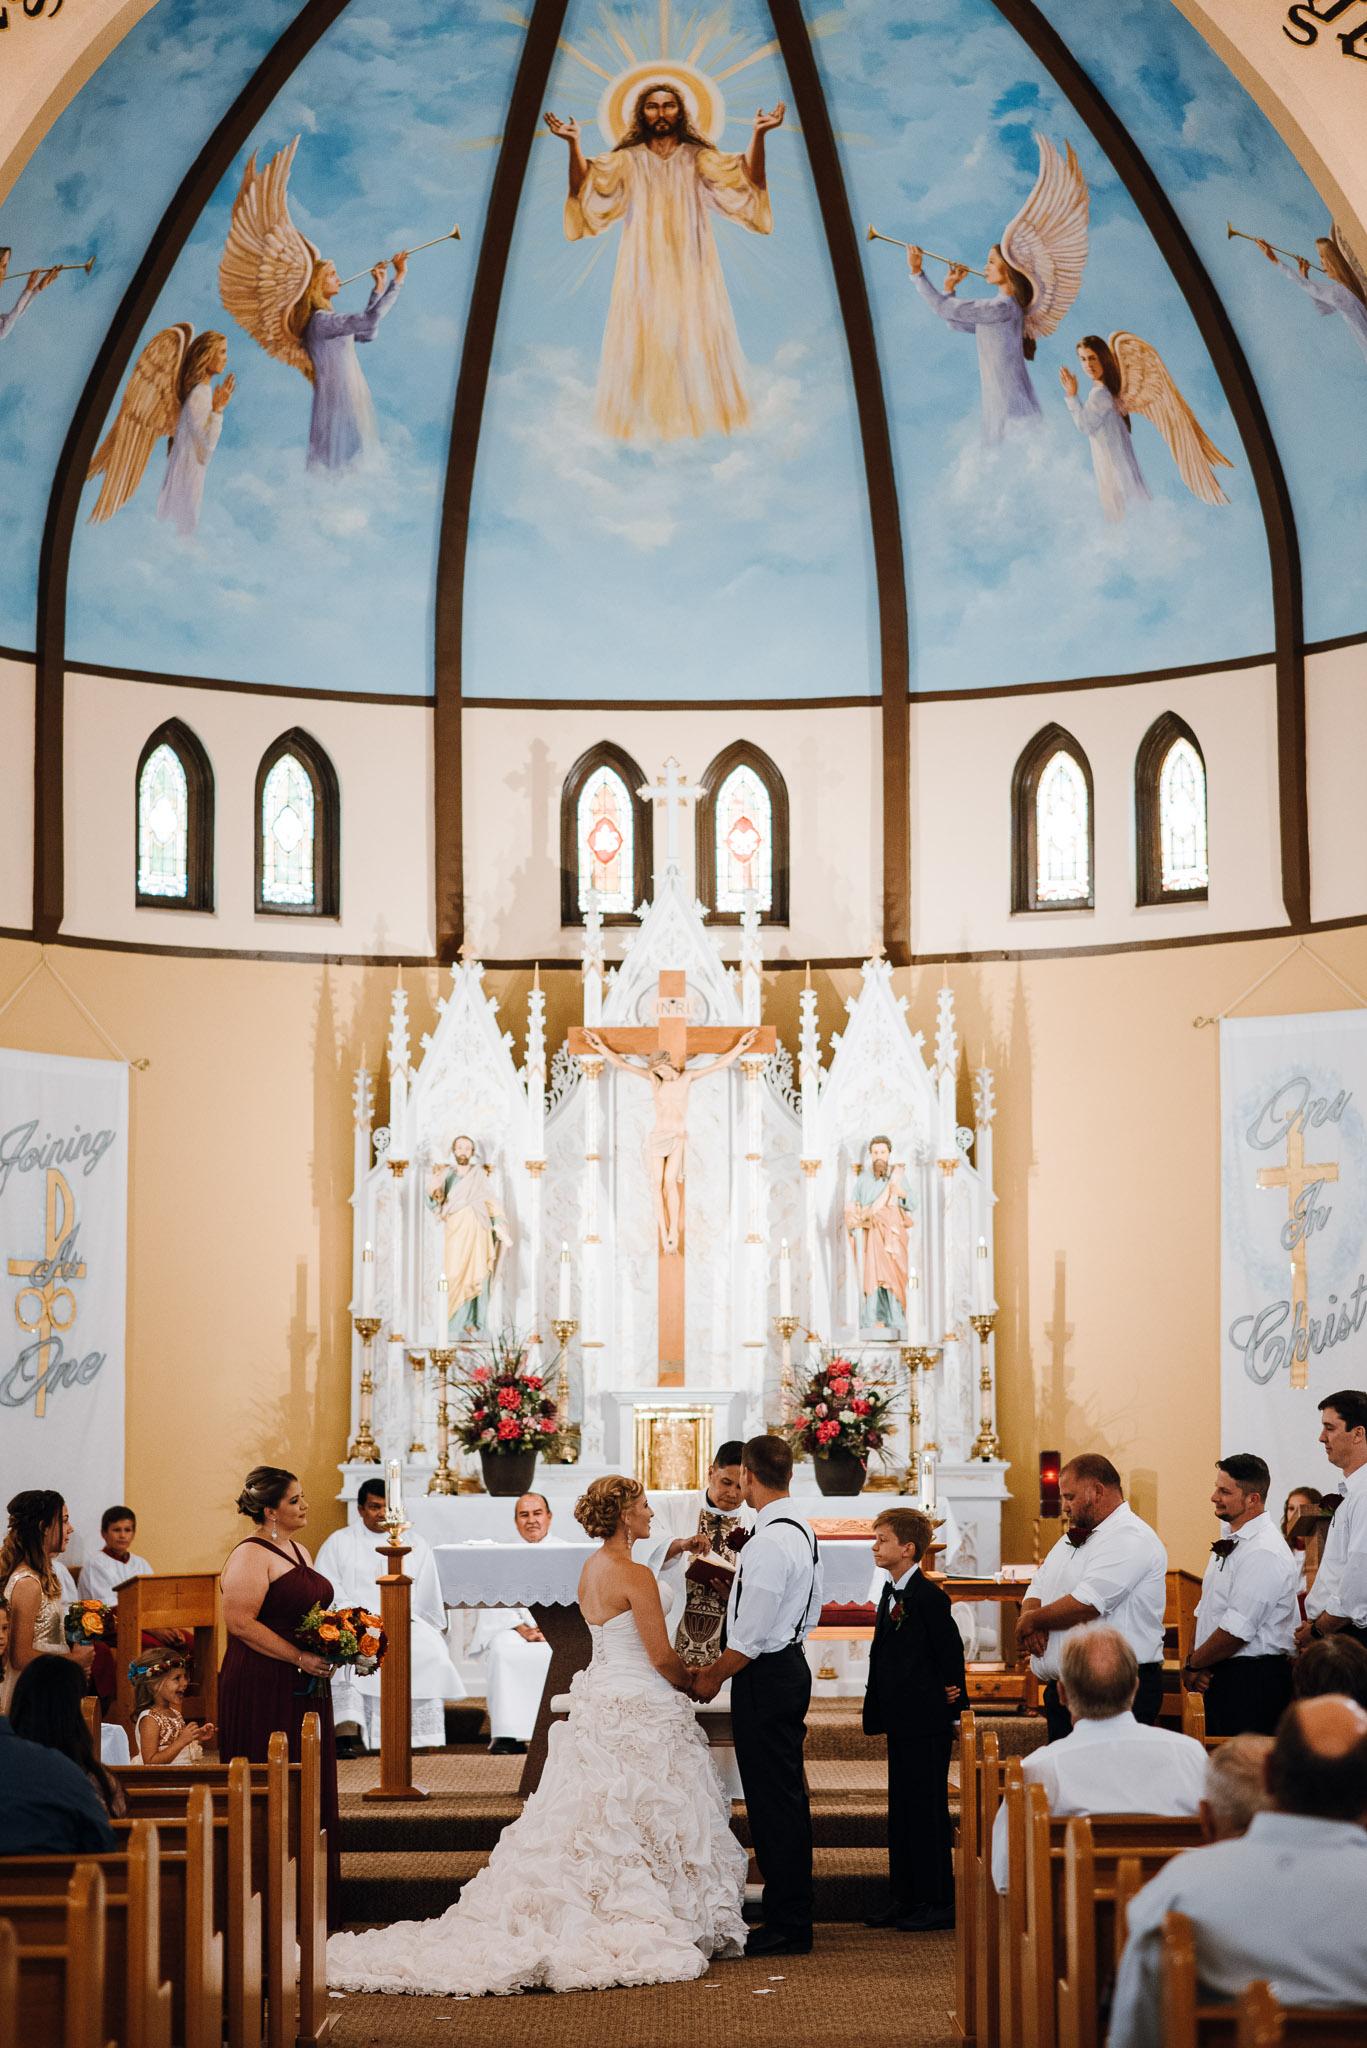 Rowena-West-Texas-Wedding-Photographer-Gillian&Ryan-0023.jpg